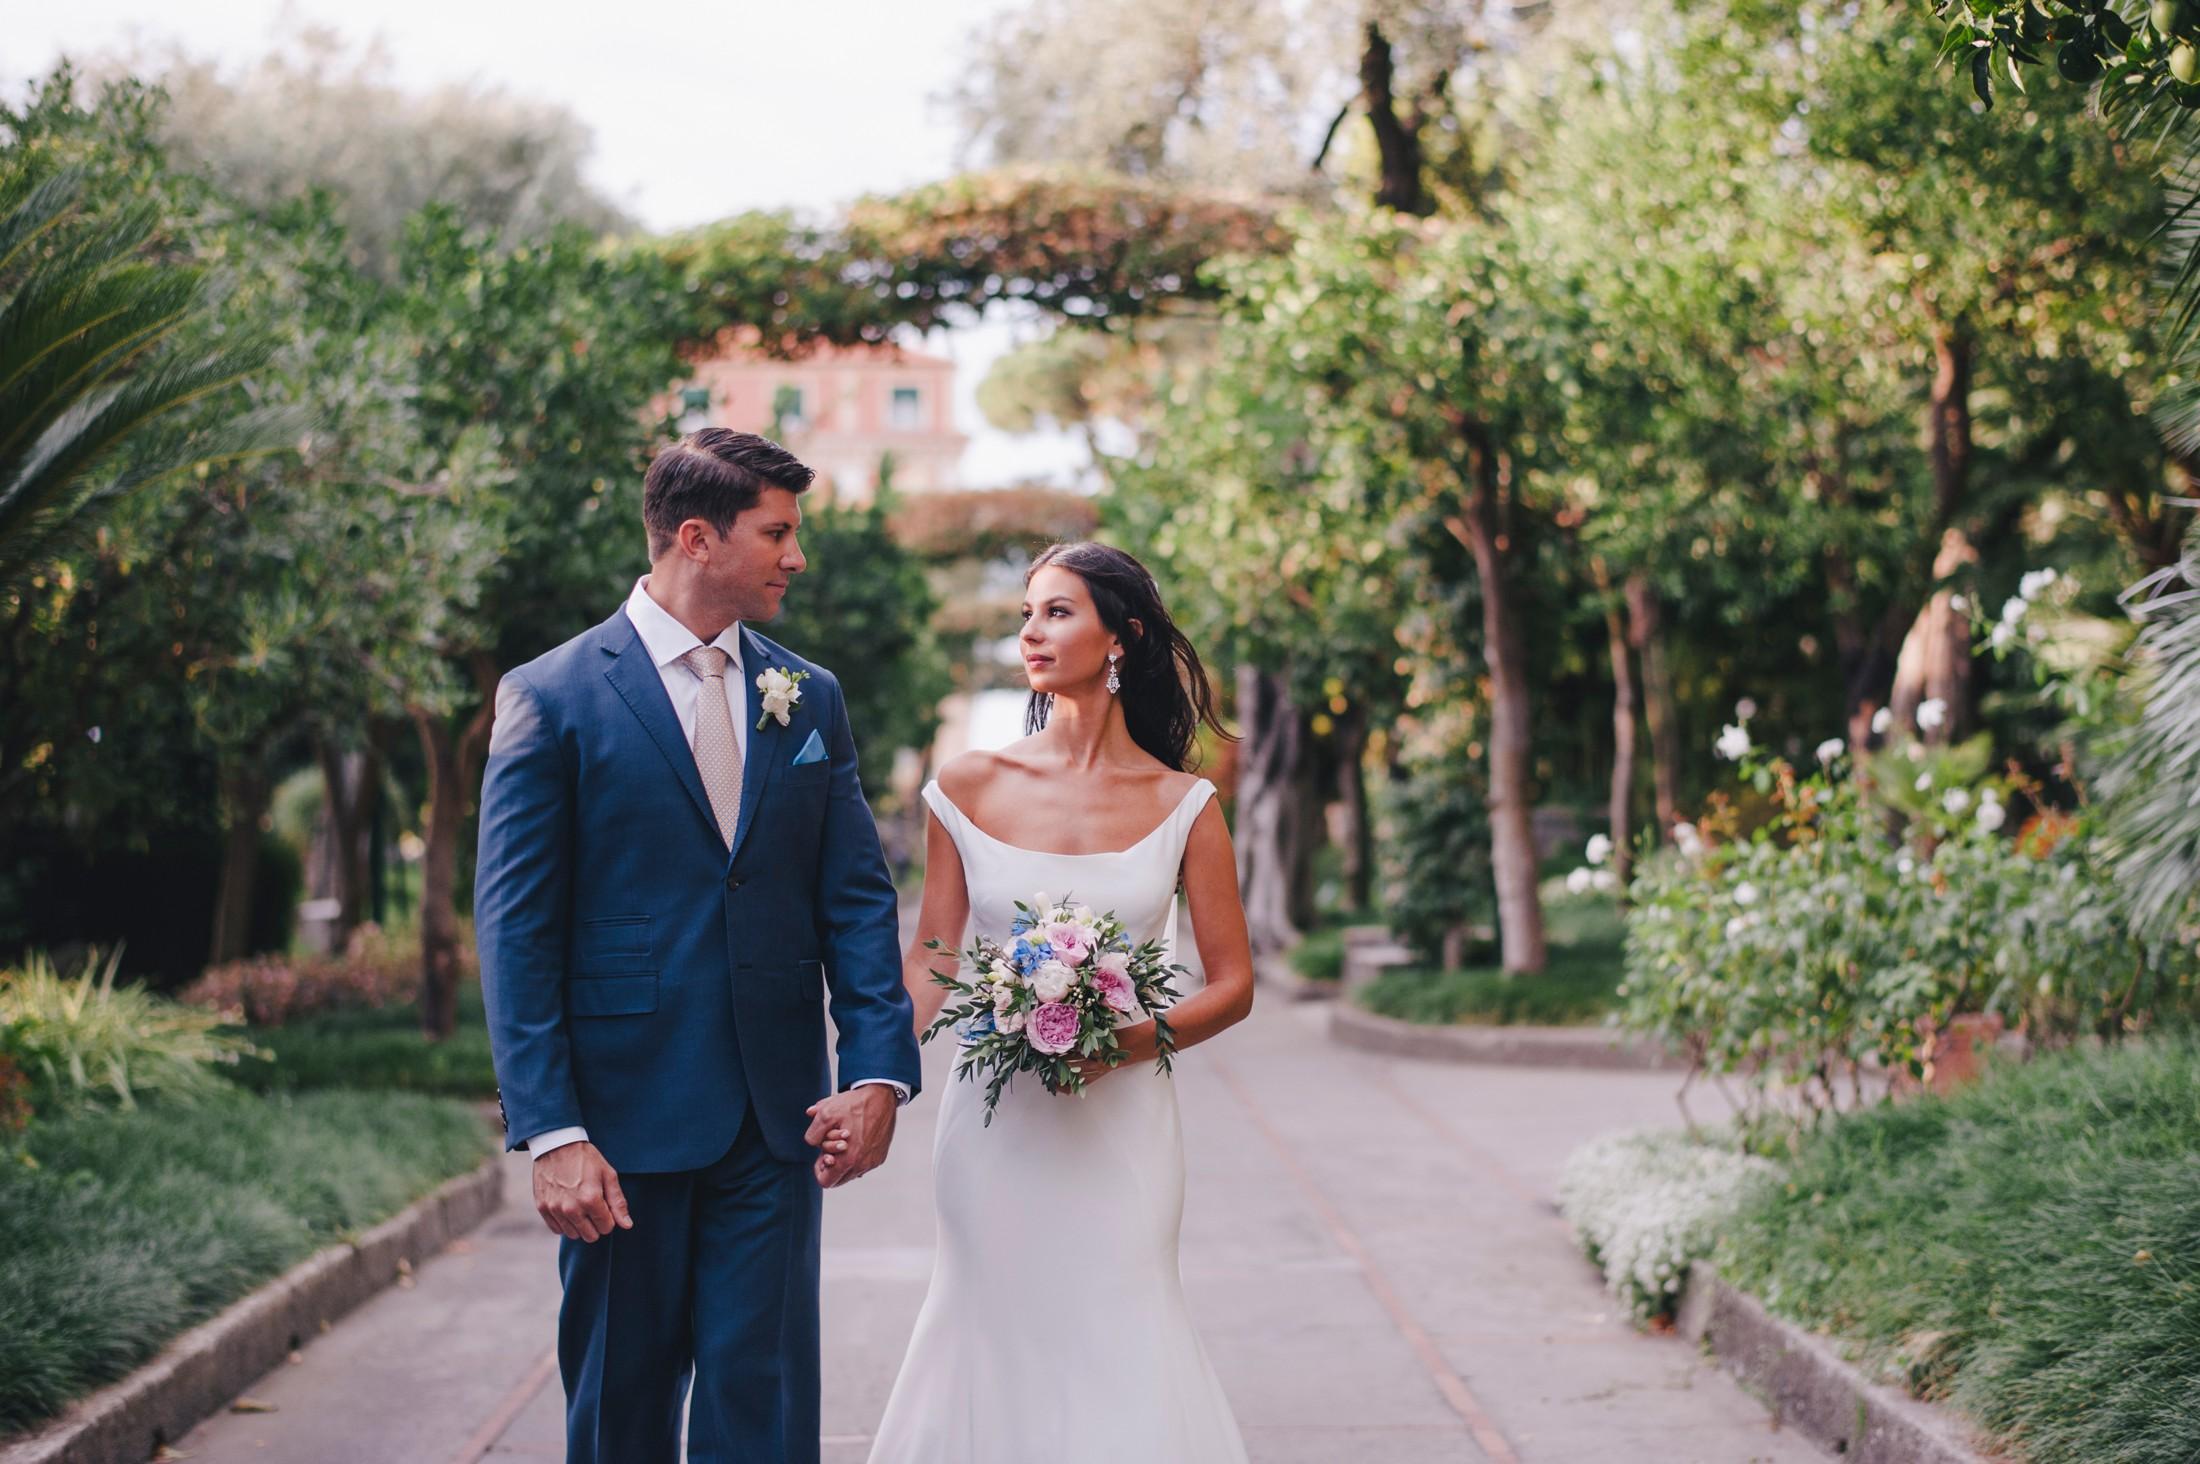 wedding in sorrento bride and groom walking together